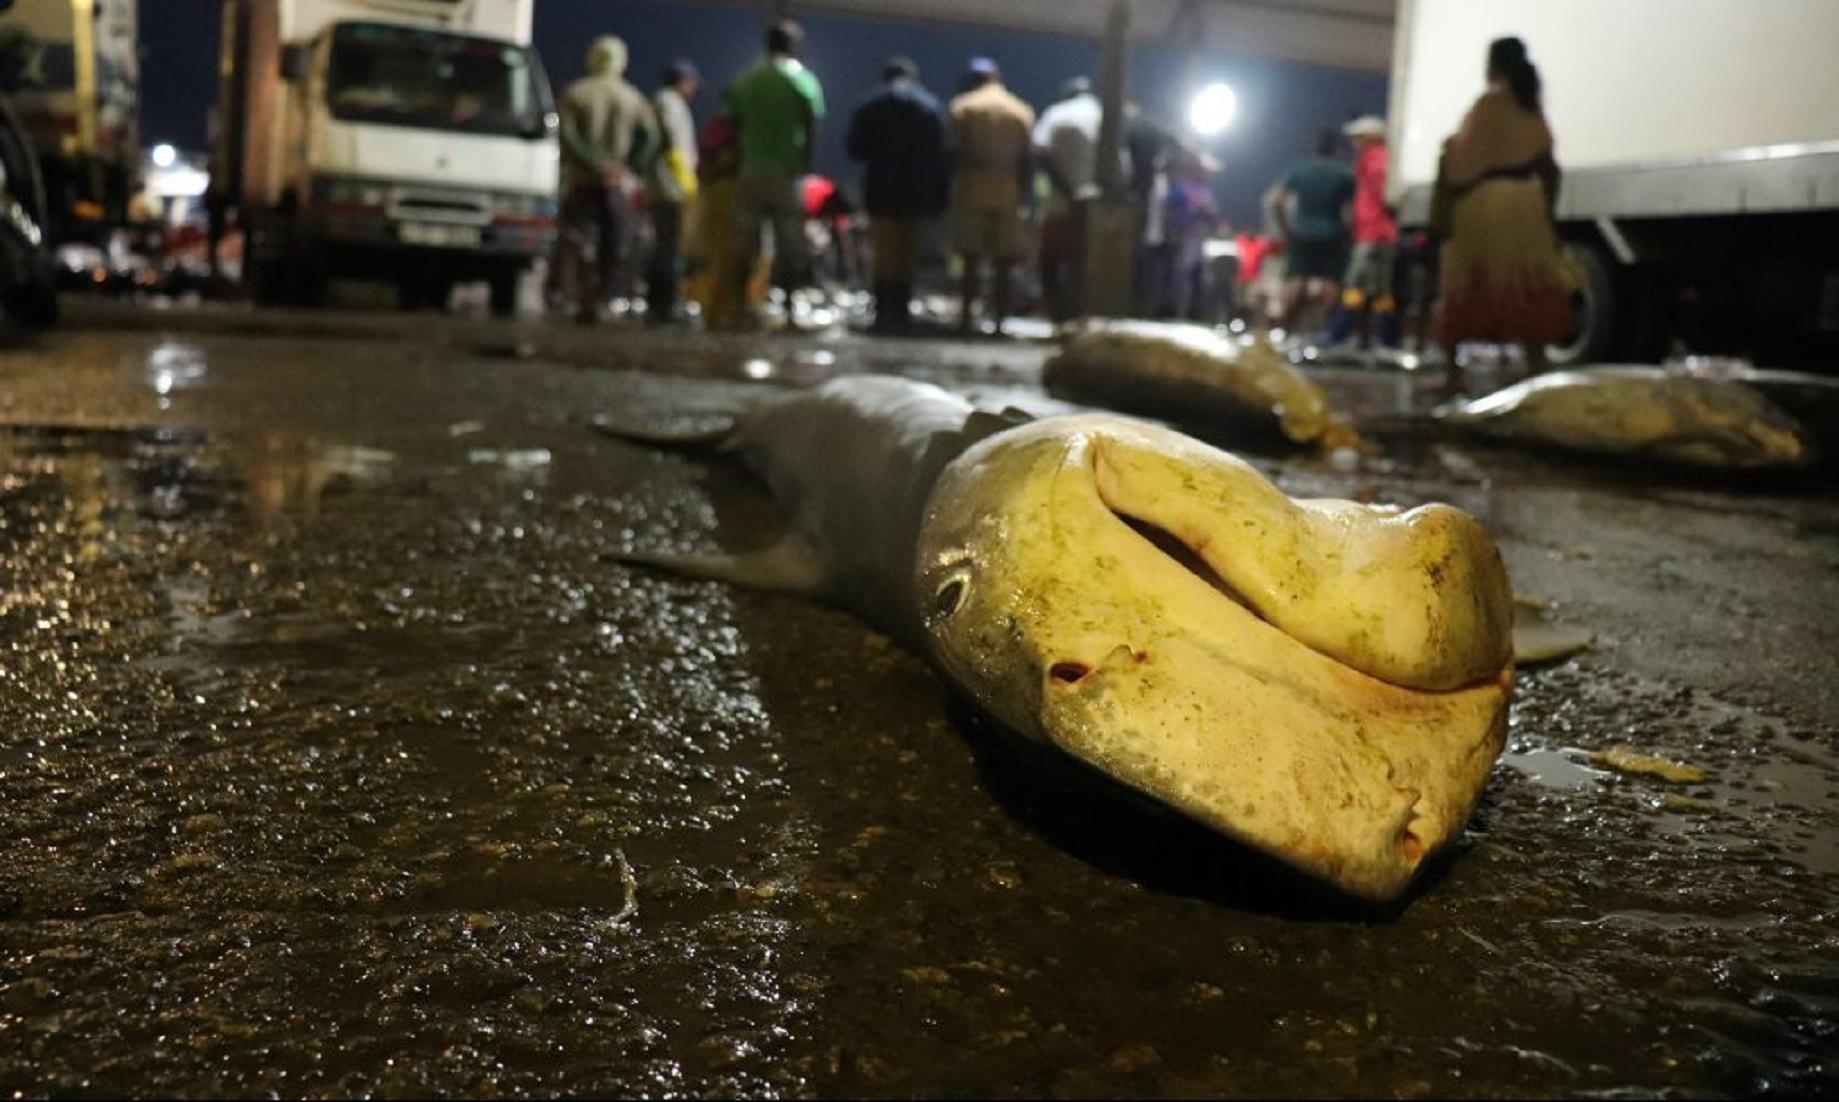 Sri Lanka To Probe Illegal Shark Fishing In Famous Tourist Spot